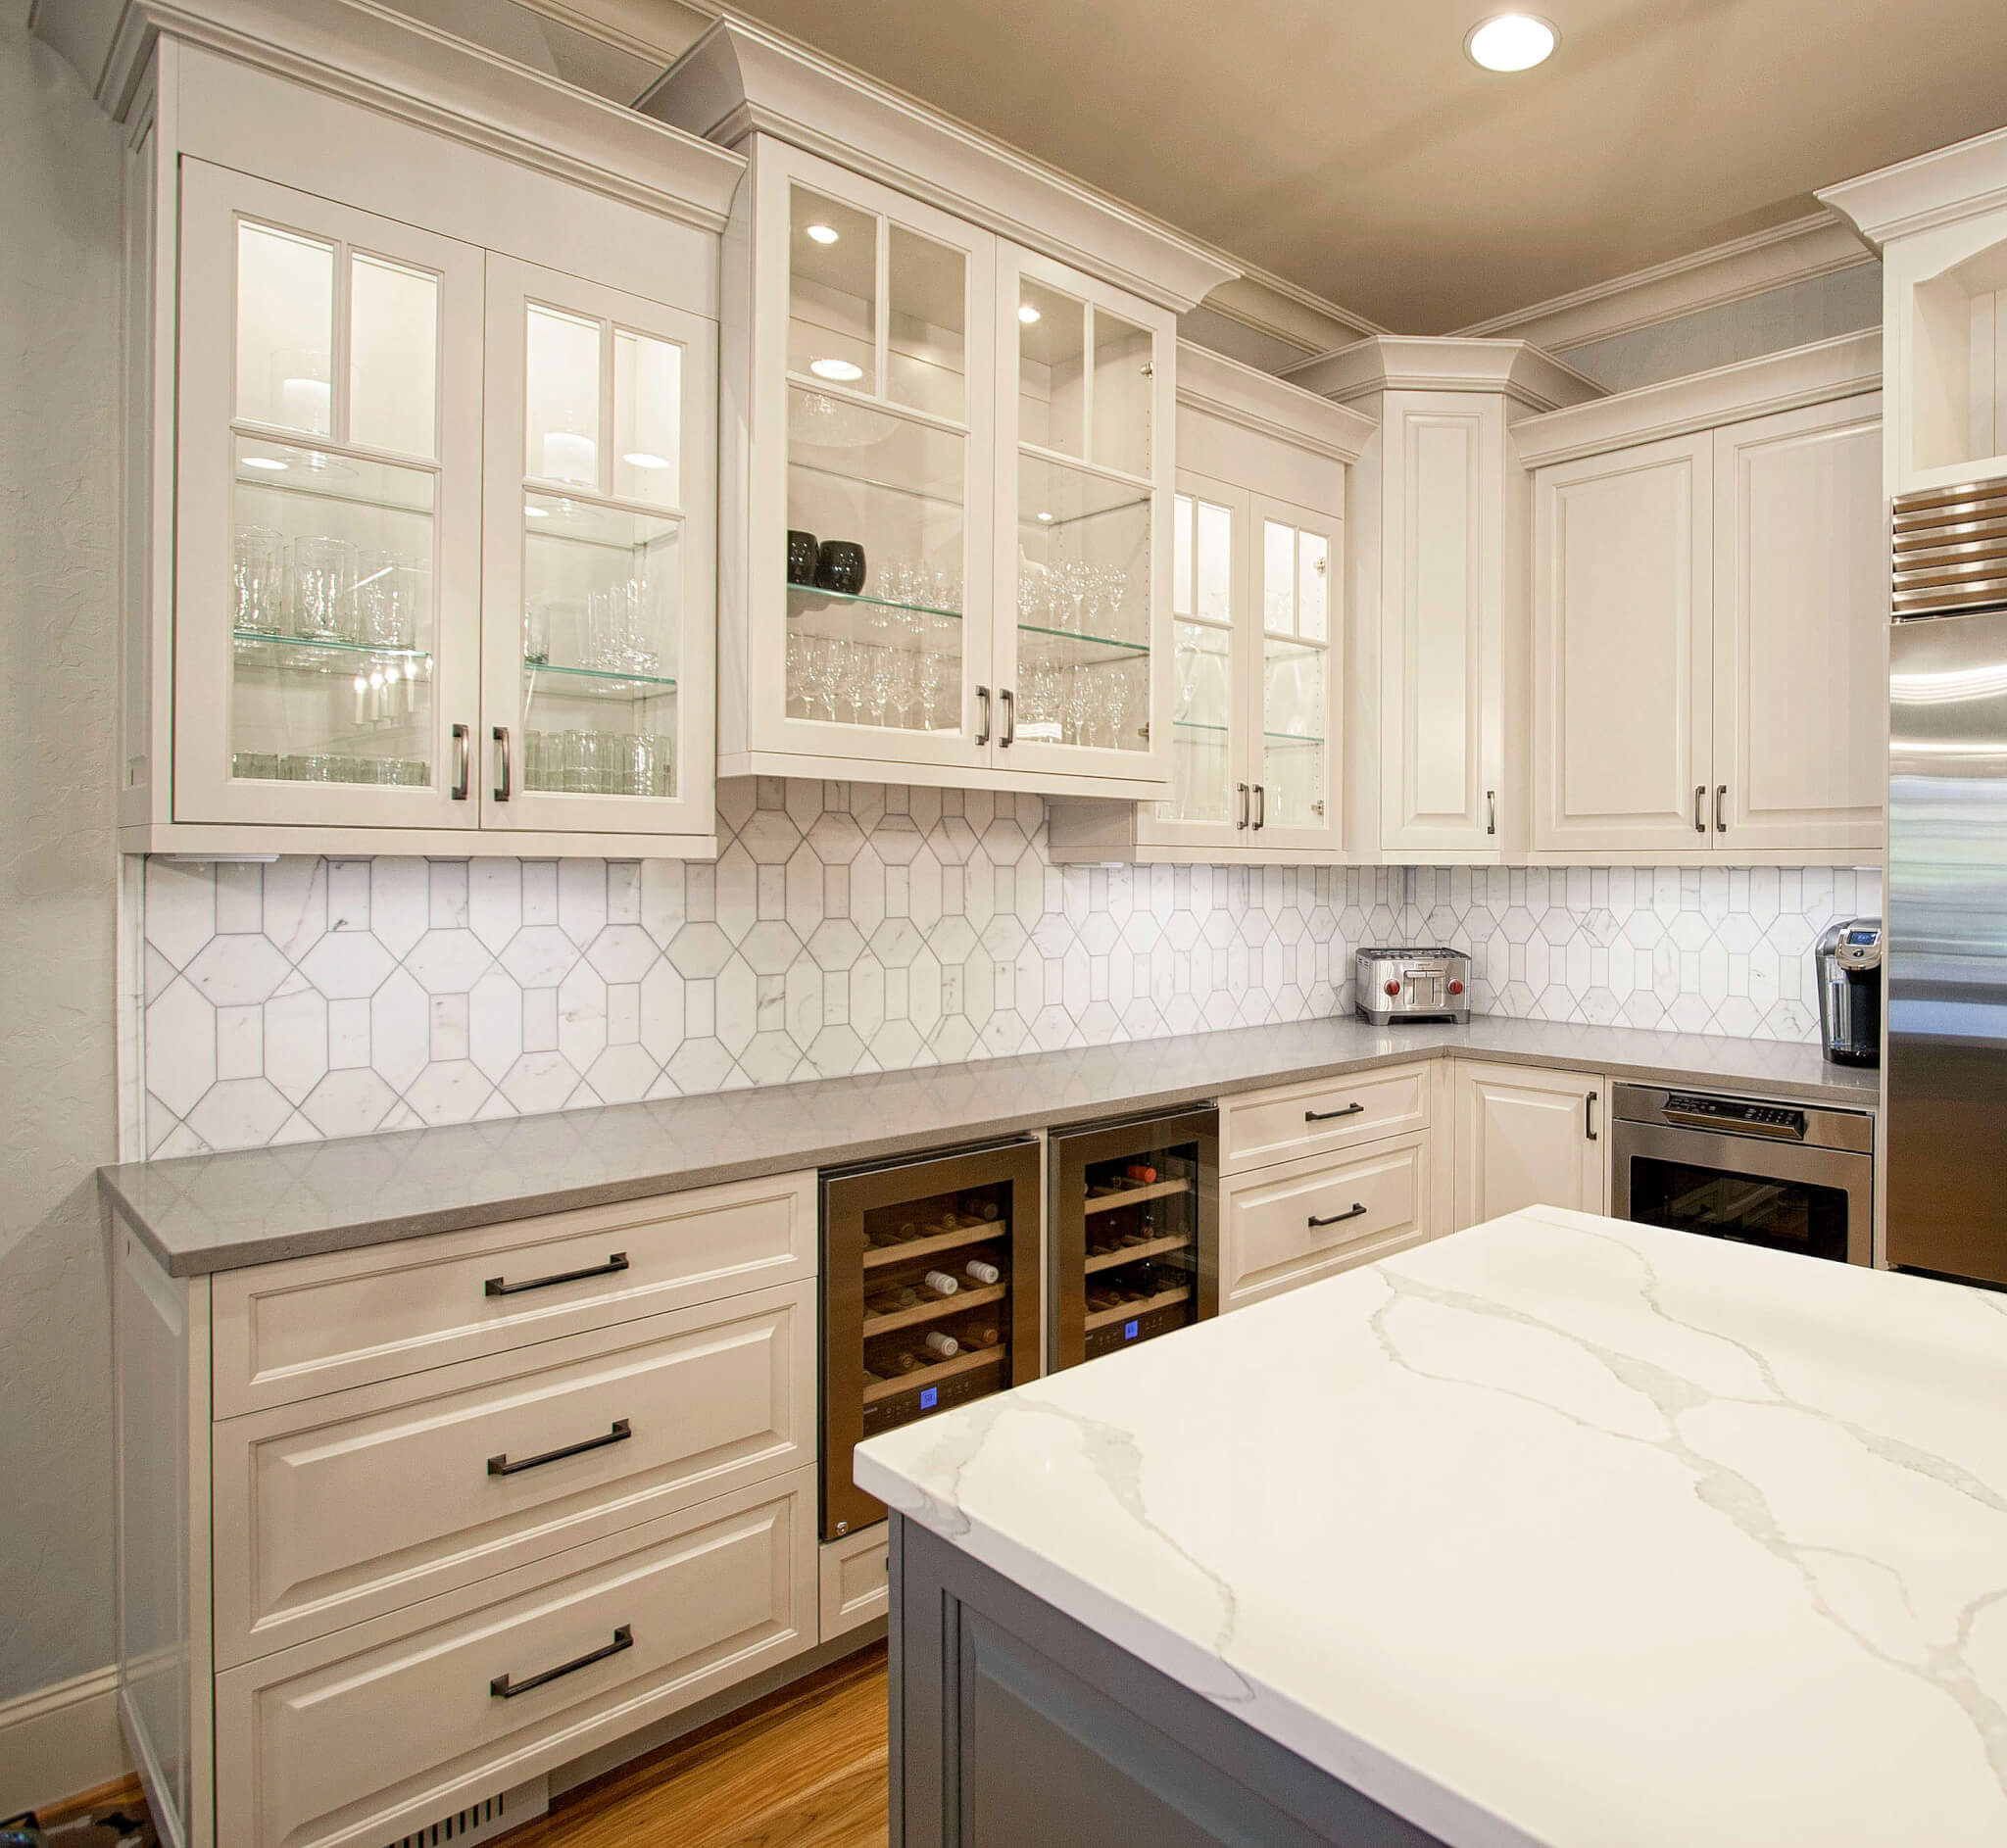 Glass Shelves Kitchen Cabinets: Quarts-countertops-backsplash-glass-cabinet-doors-glass